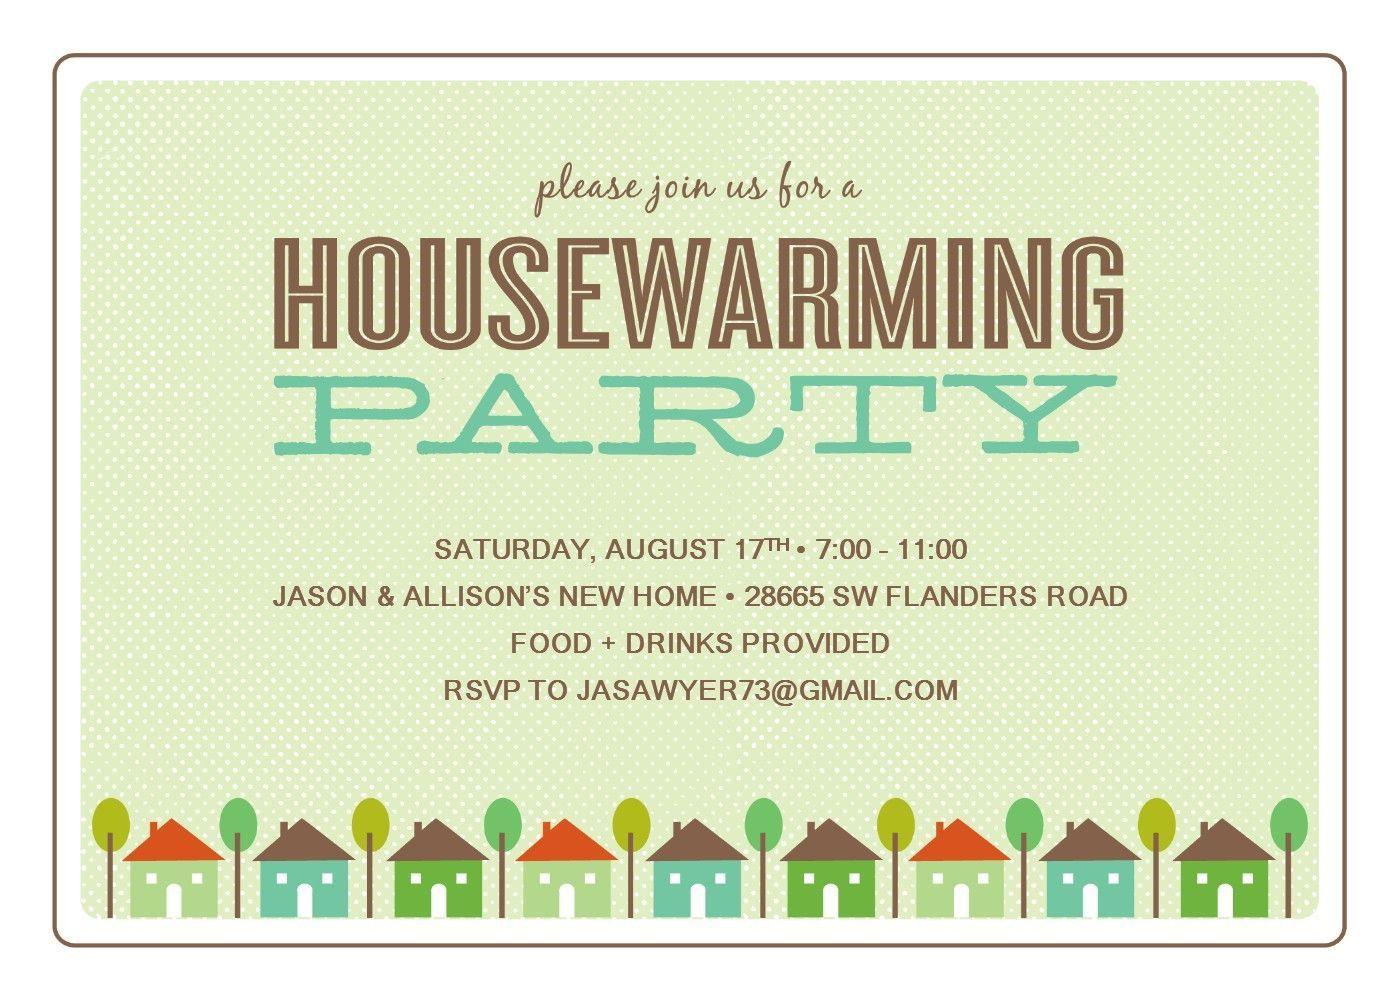 001 Incredible Free Housewarming Invitation Template Idea  Templates Printable India Video DownloadFull